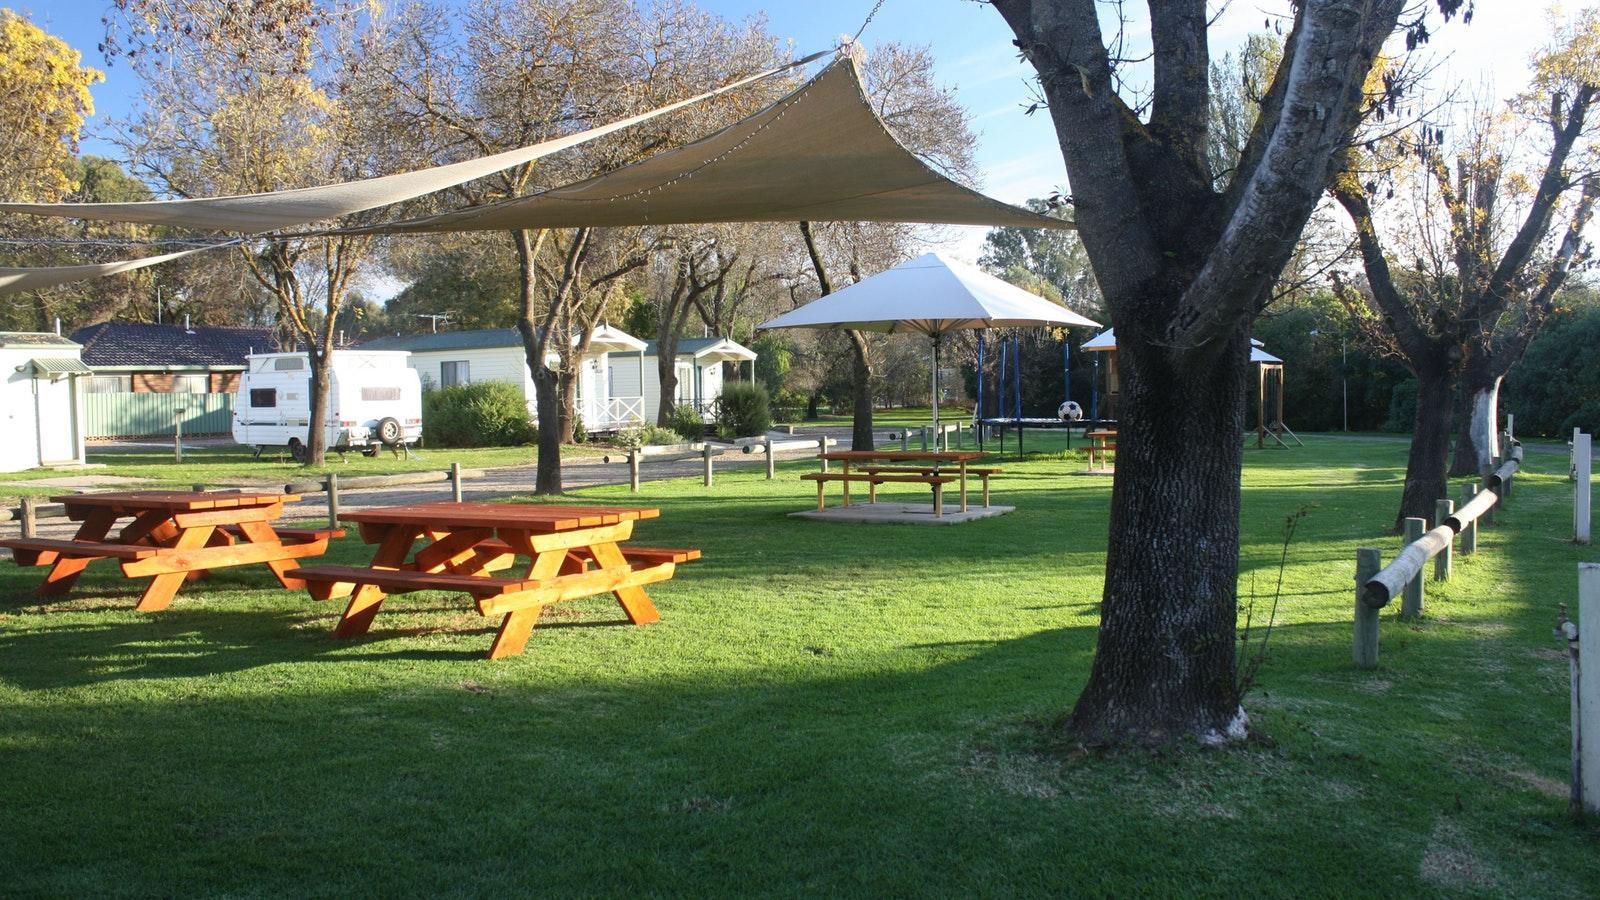 BIG4 North Cedars Holiday Park Wangaratta